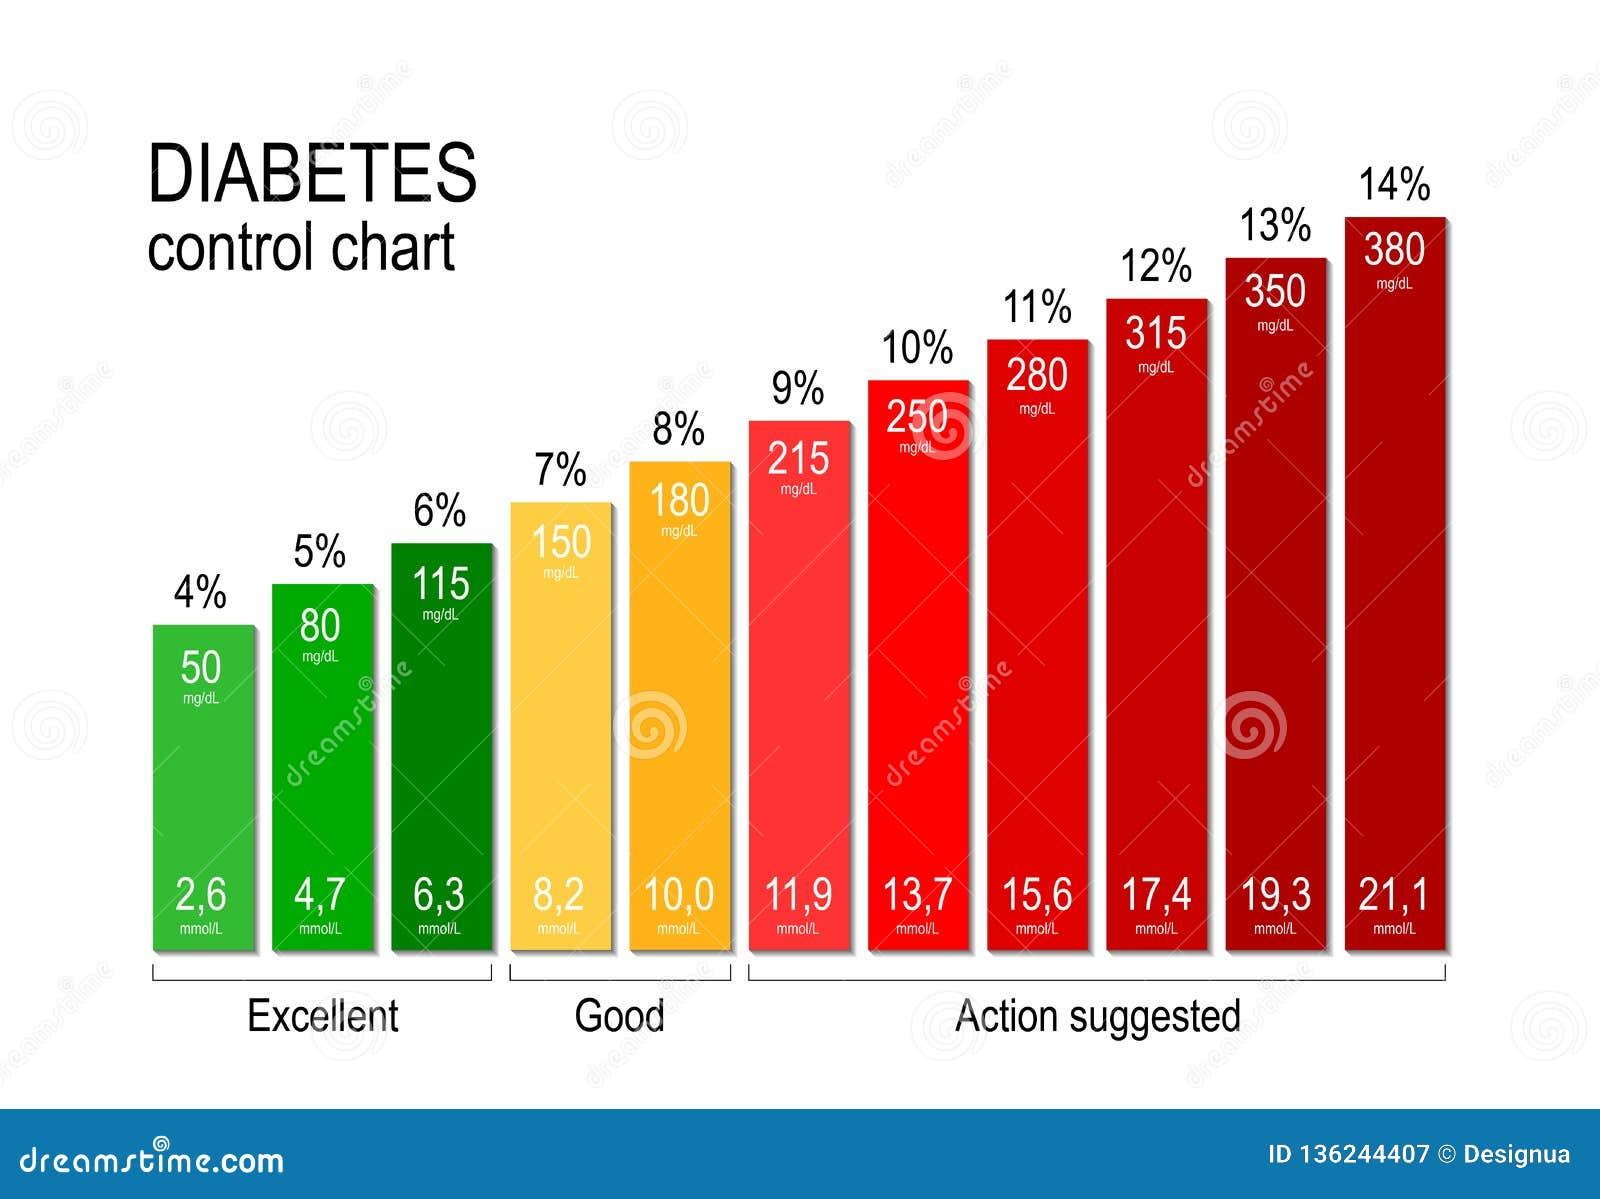 Diabetes Control Chart. For A Diabetic Maintaining An ...